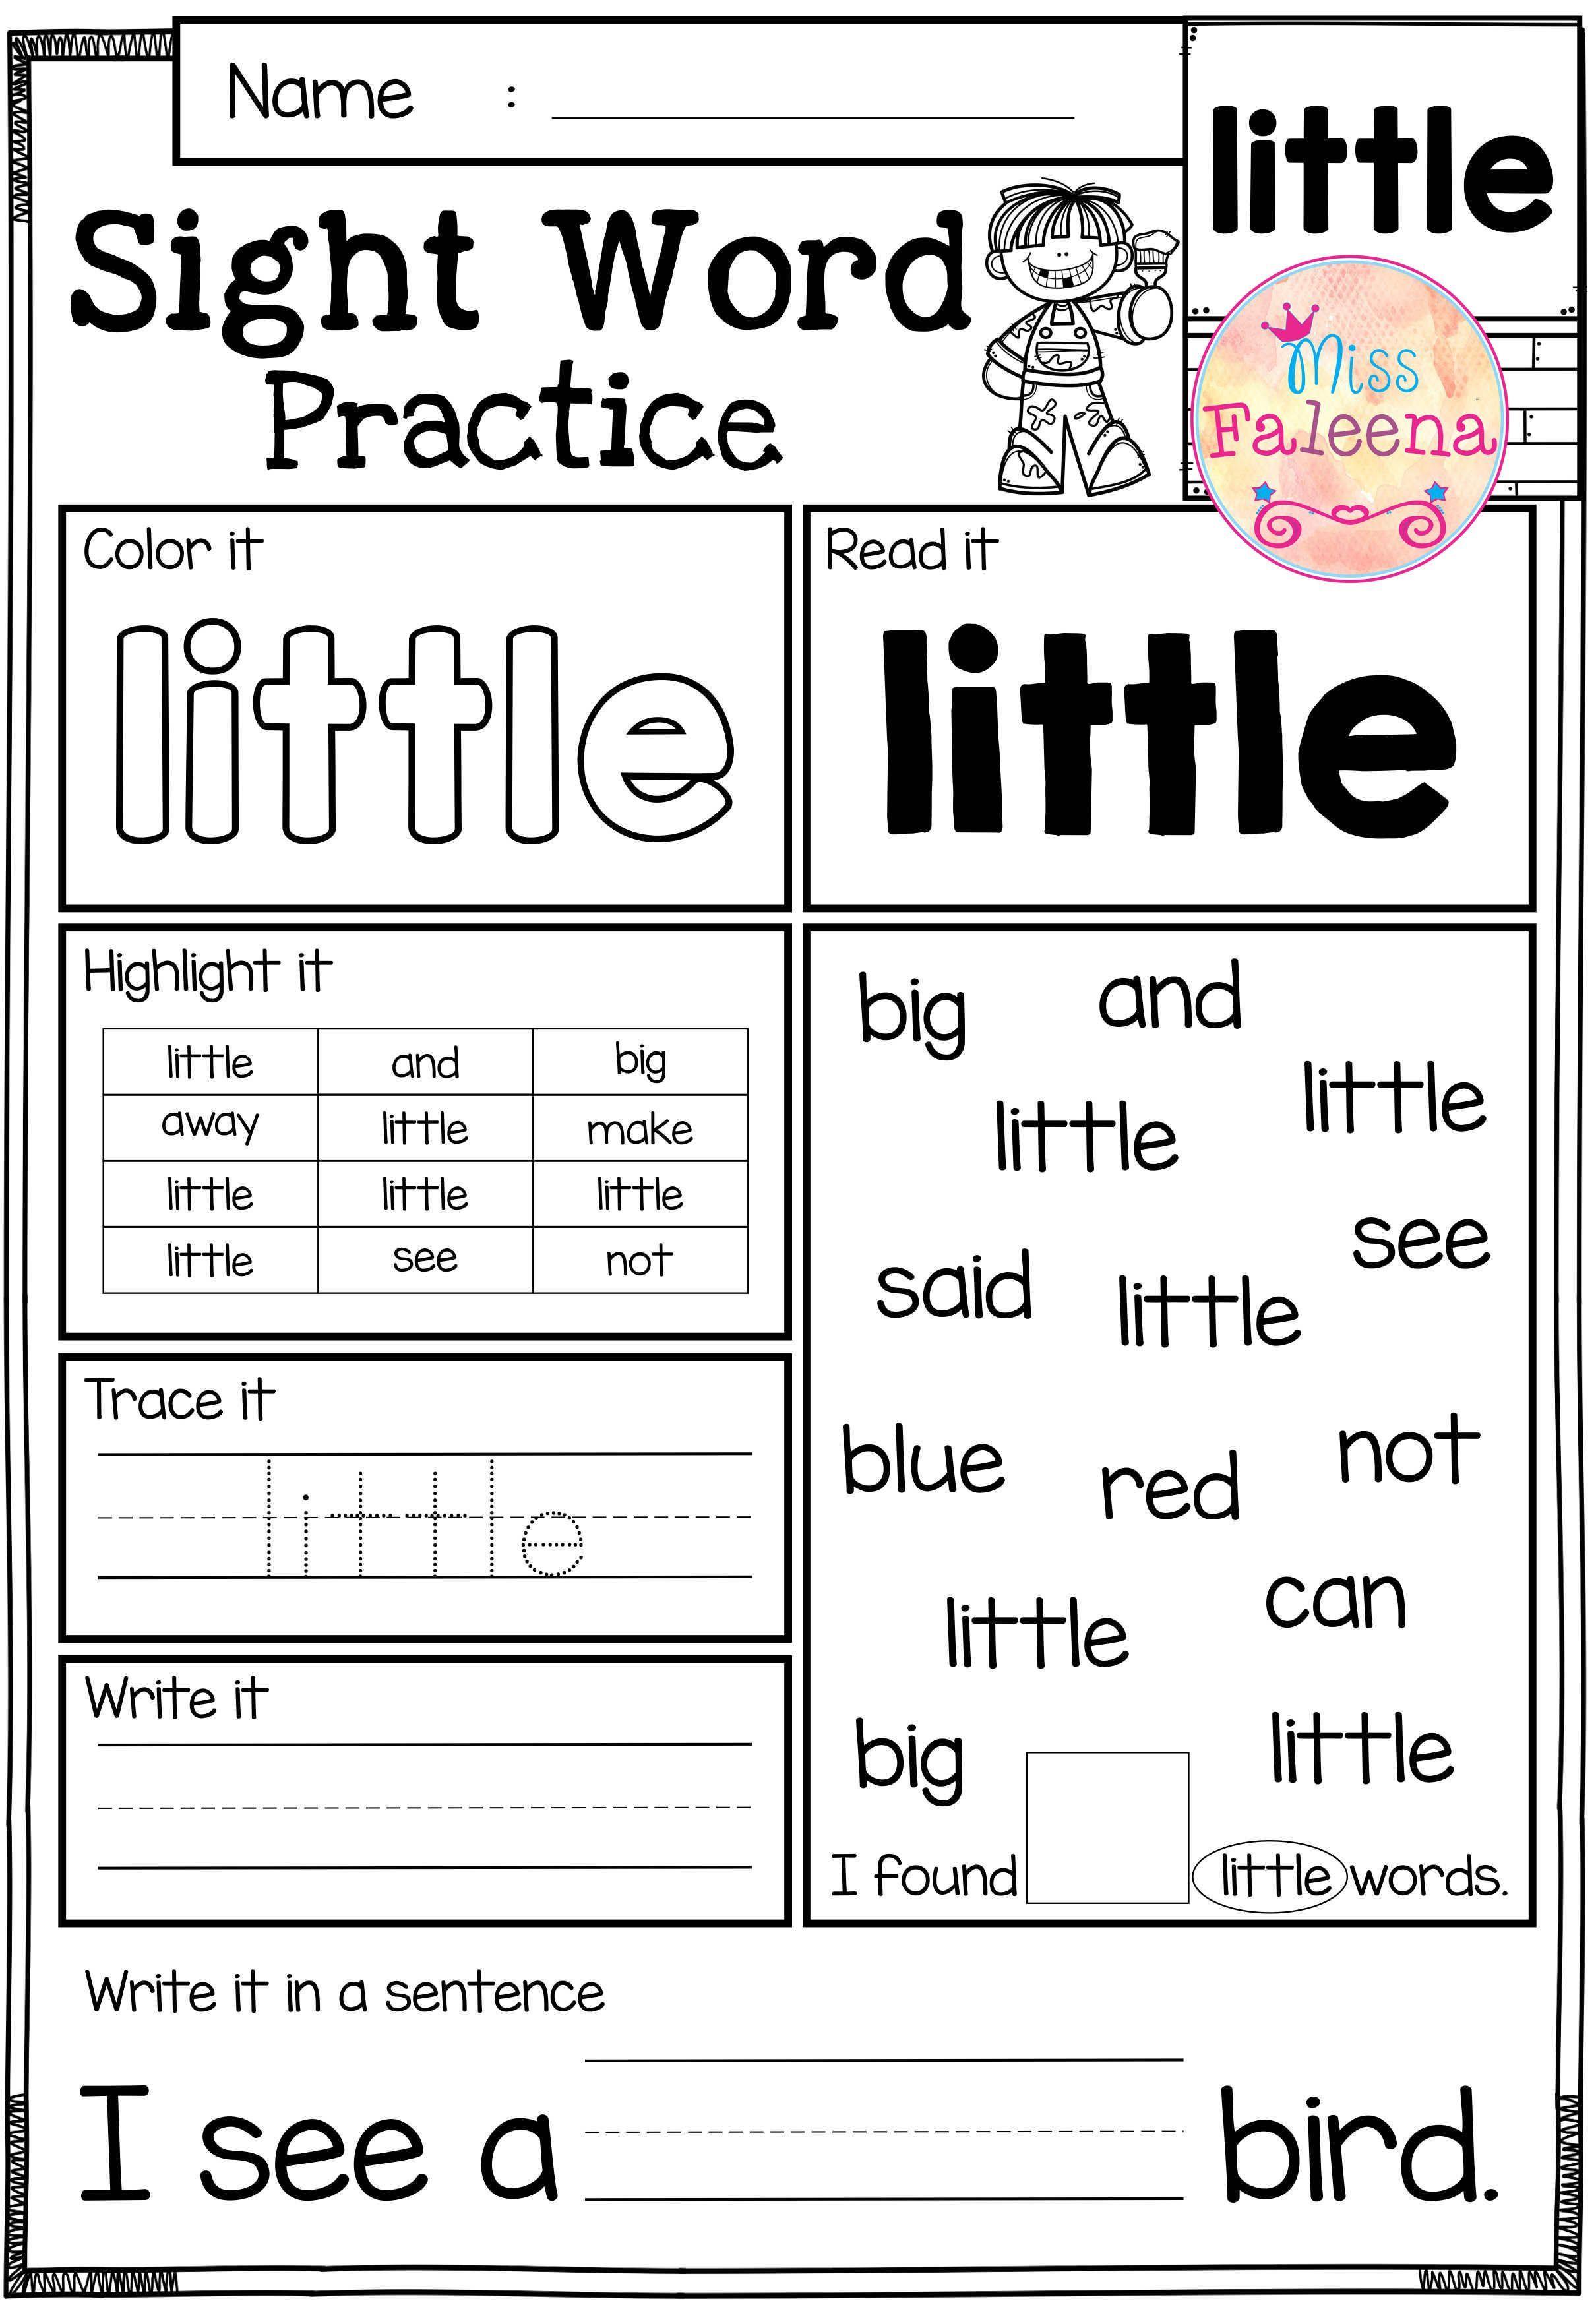 Sight Word Practice Preprimer Teachingchildren